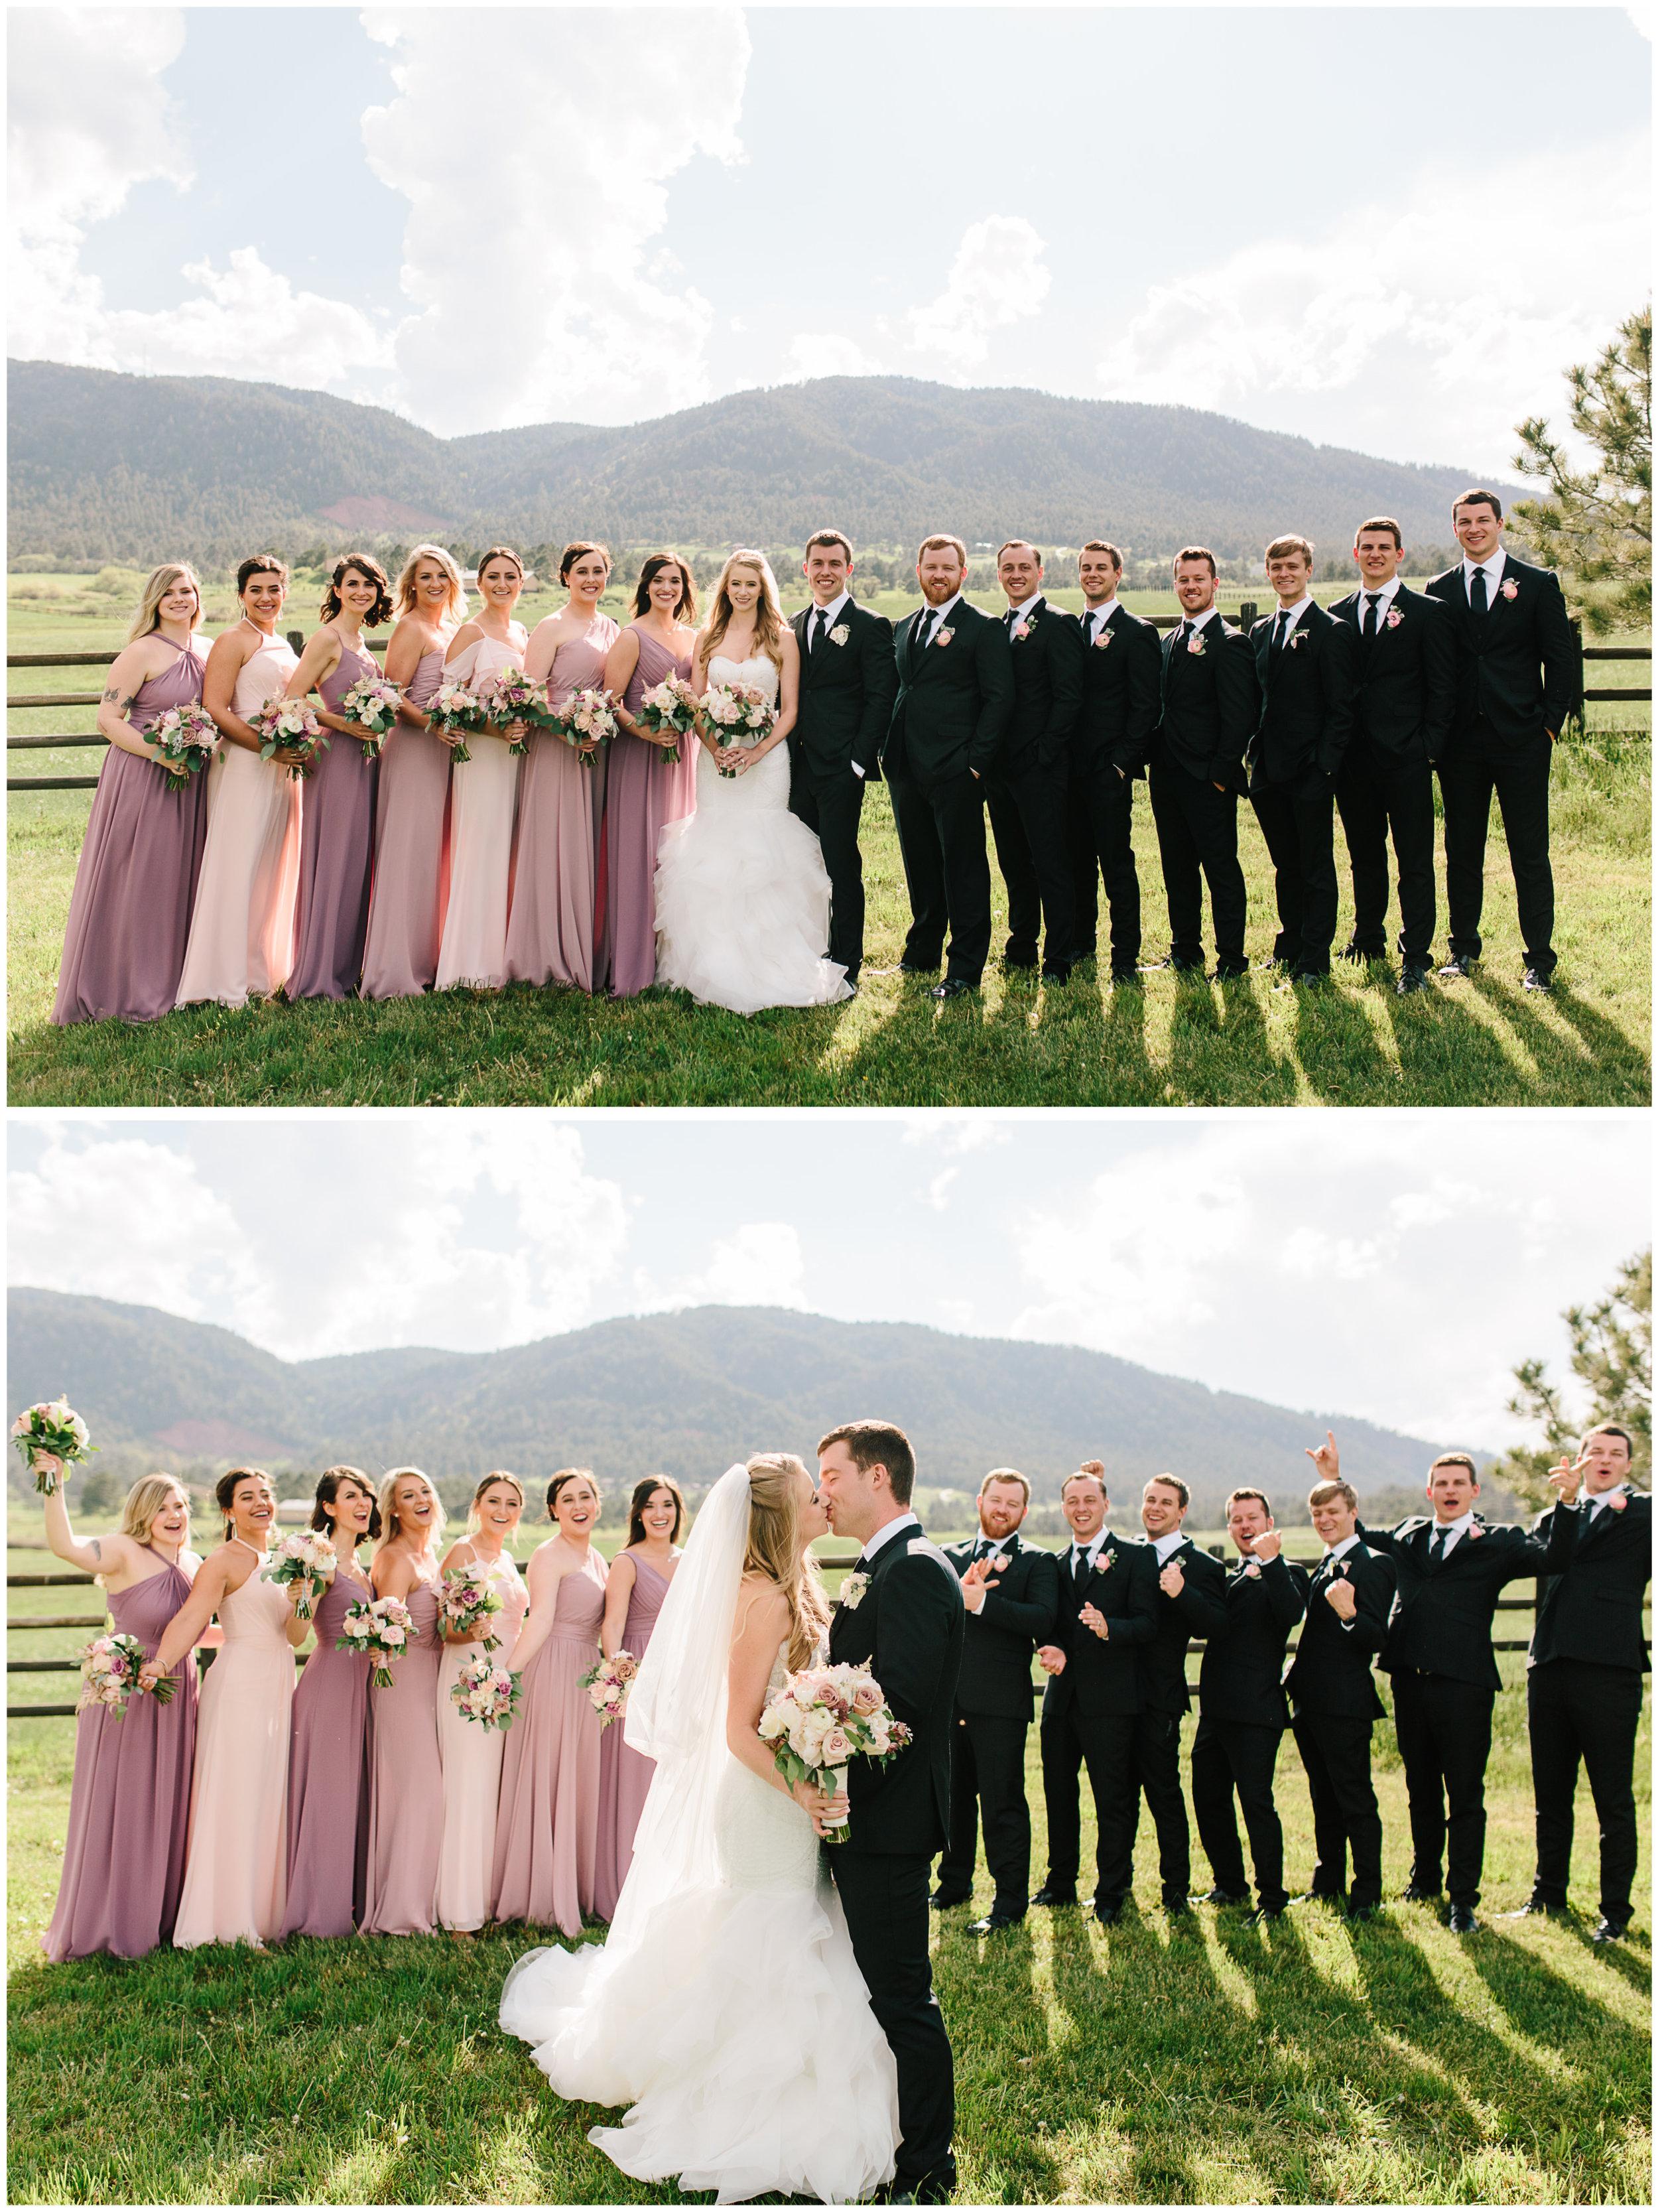 spruce_mountain_ranch_wedding_41.jpg